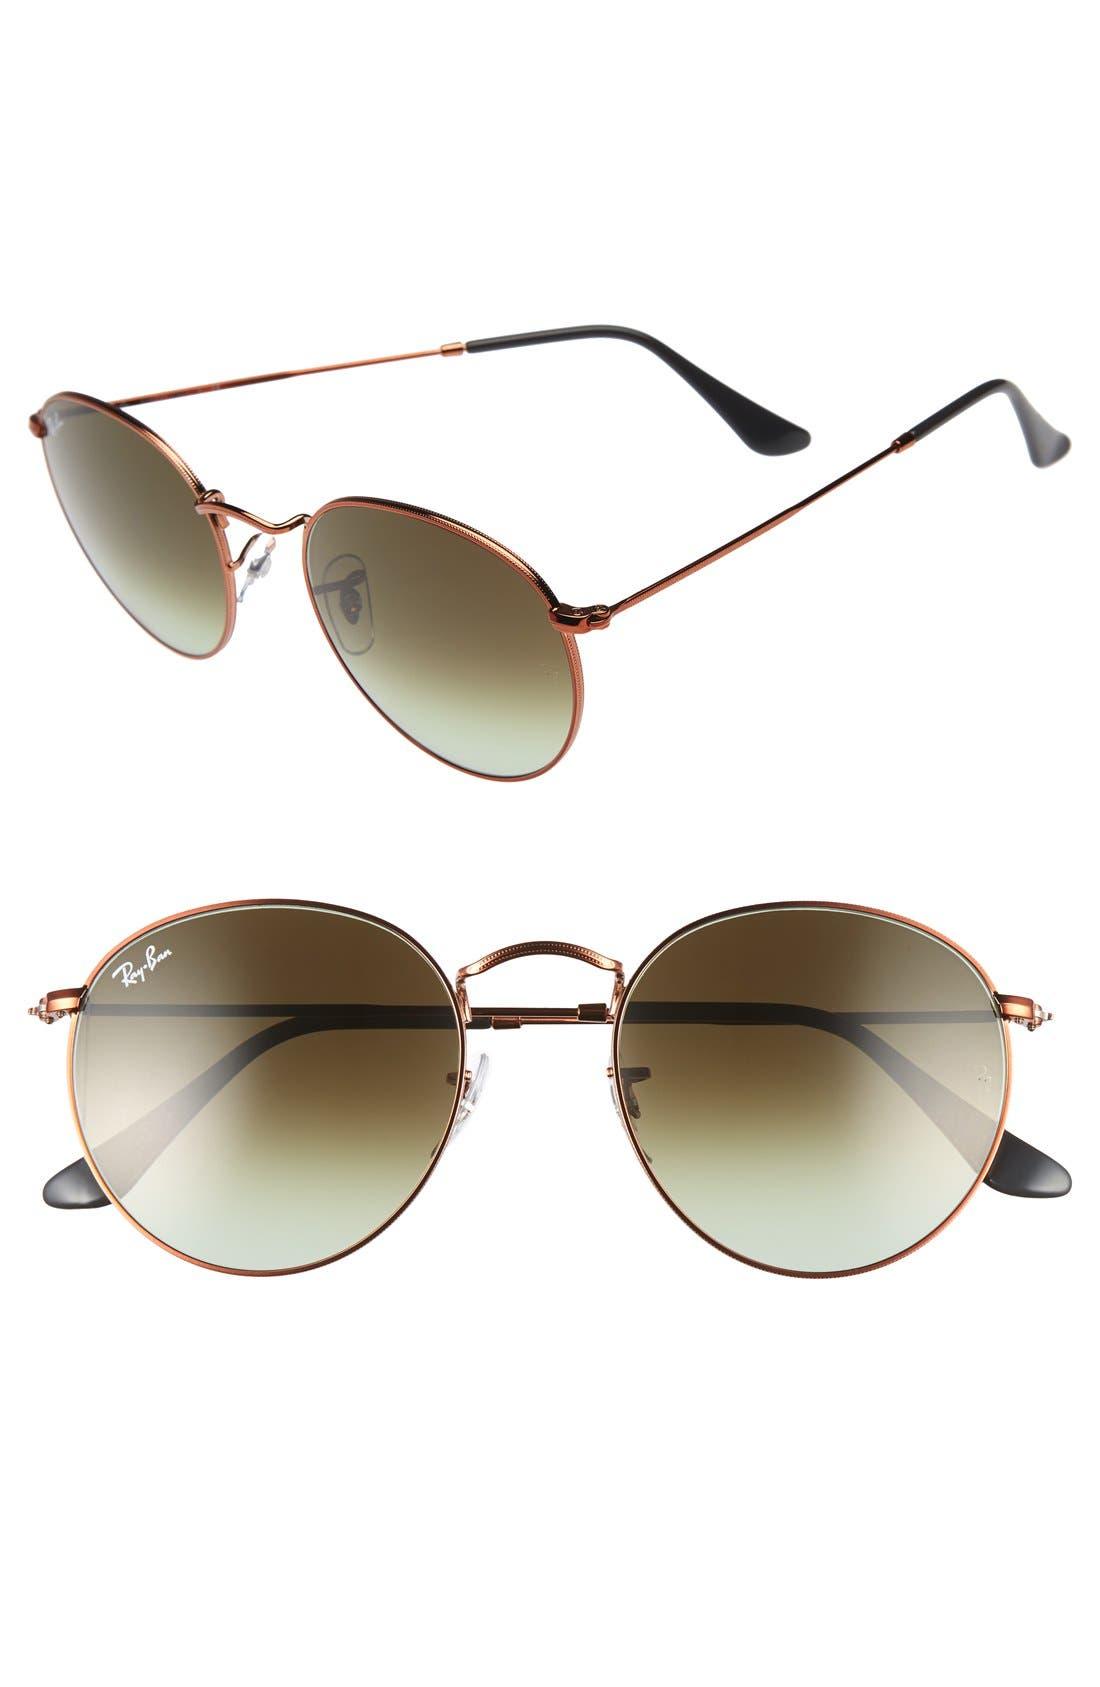 Icons 53mm Retro Sunglasses,                             Main thumbnail 1, color,                             Green/ Brown